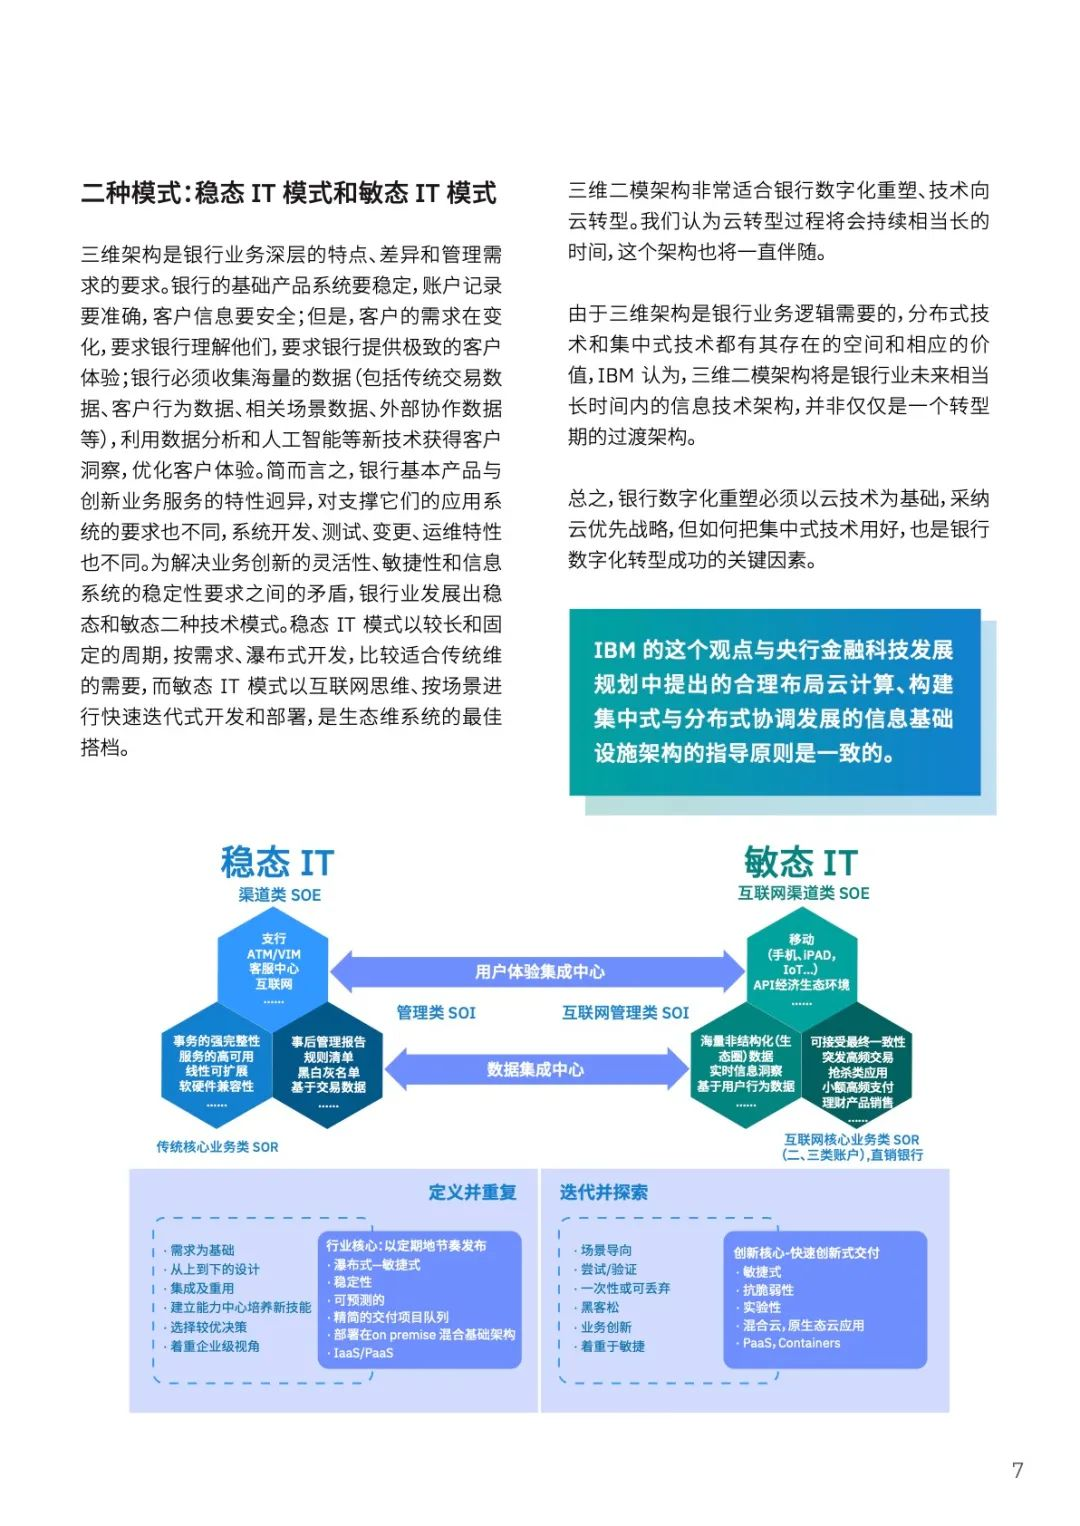 IBM金融解决方案:银行关键应用如何实现云端数字化